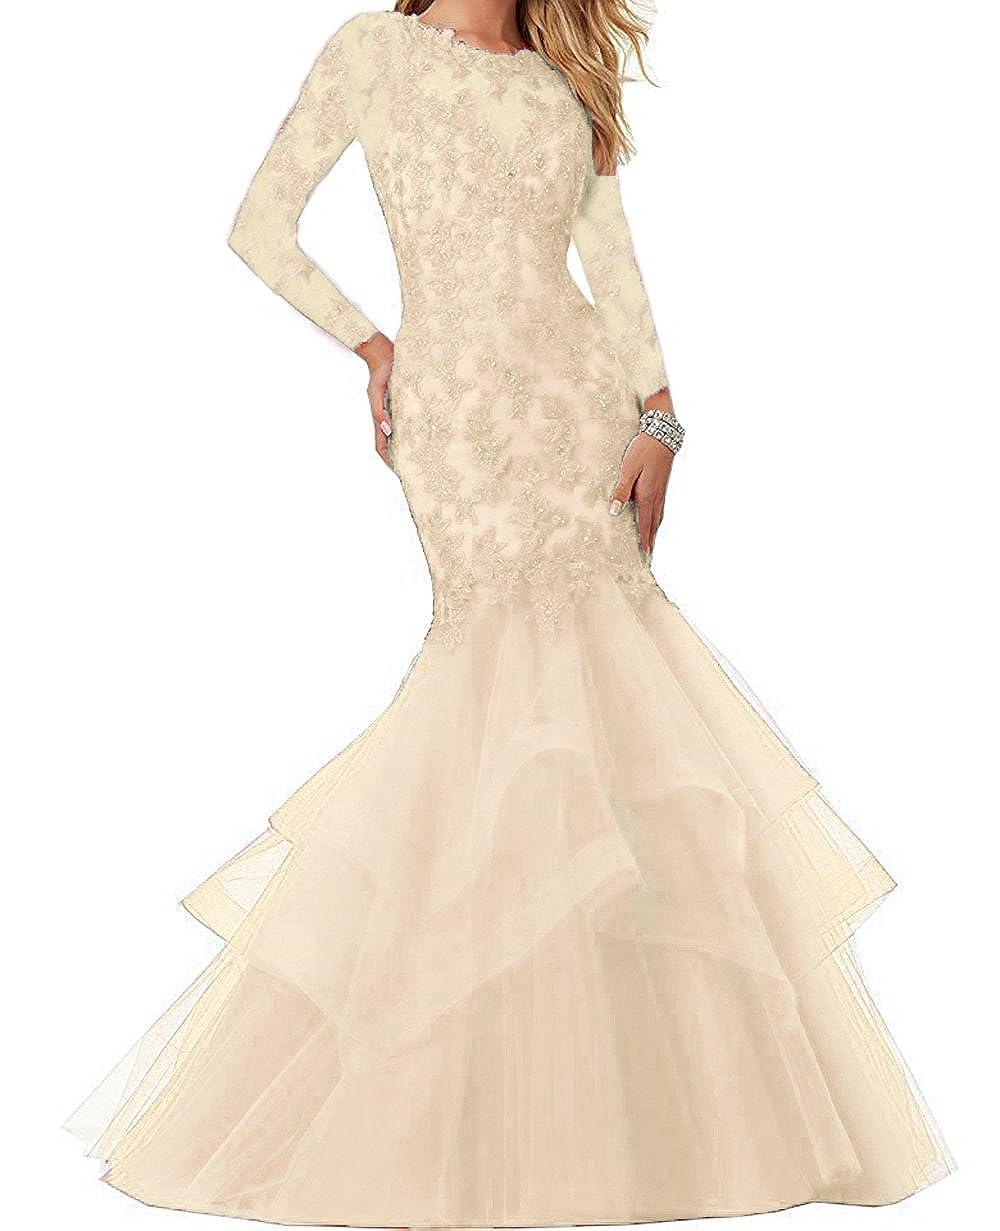 Champagne Ellenhouse Women's Long Sleeve Mermaid Applique Prom Party Evening Dresses EL339